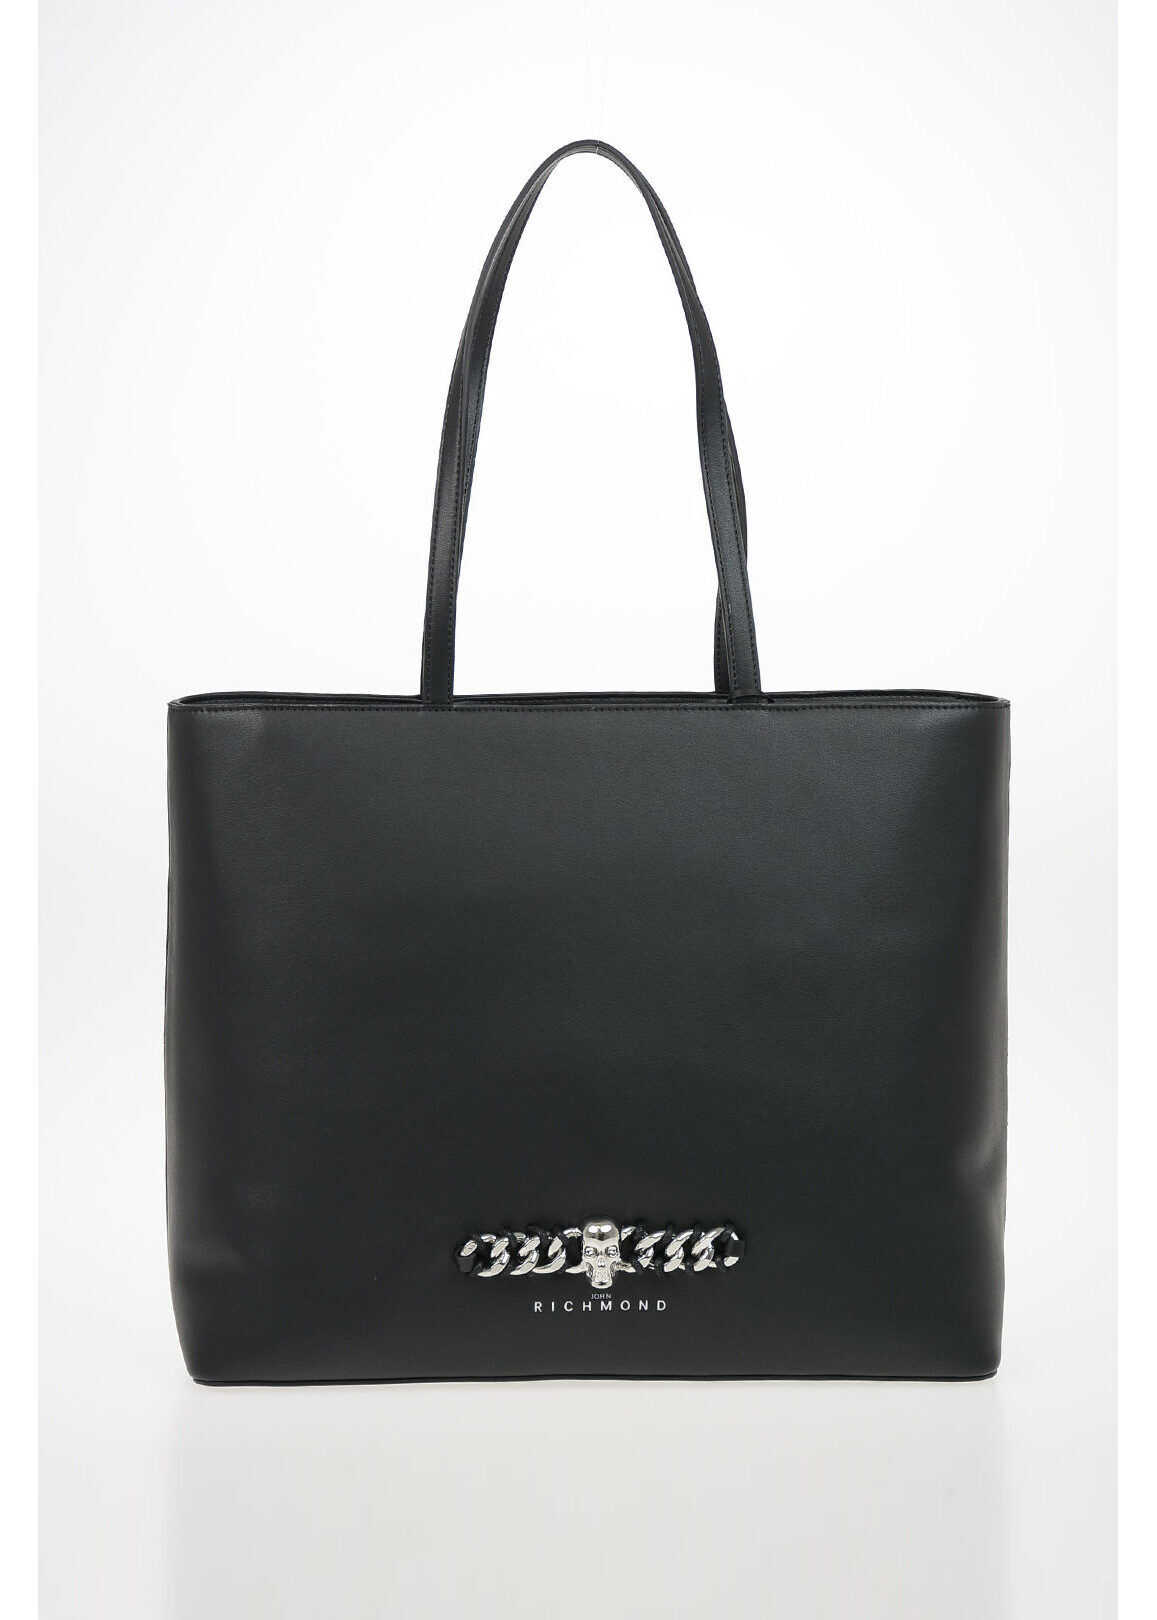 John Richmond Faux Leather APPER Tote Bag BLACK imagine b-mall.ro